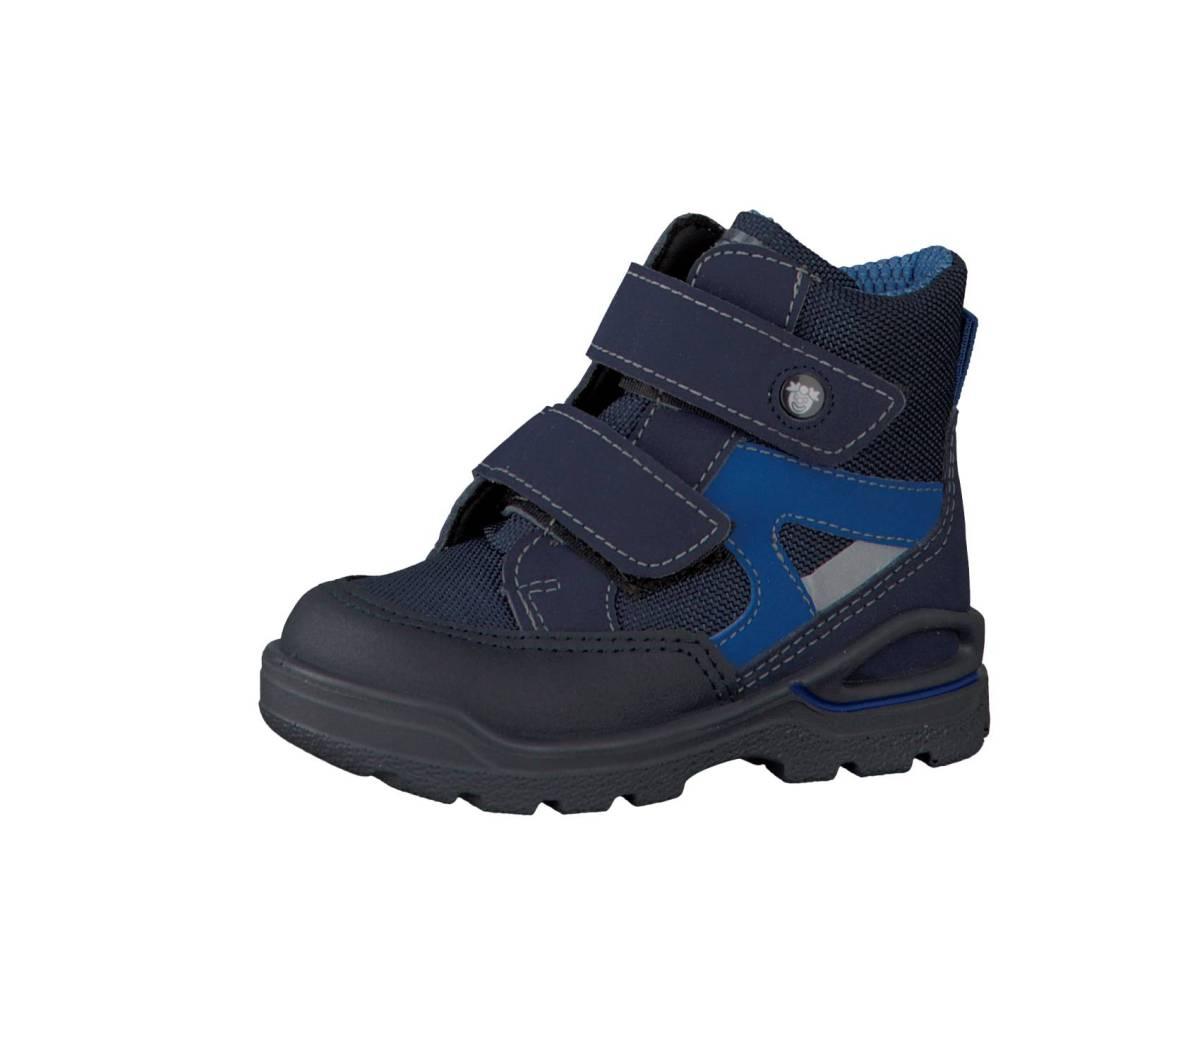 Ricosta Pepino Friso blau nautic ozean Schuhe Stiefel Boots Jungen Mädchen